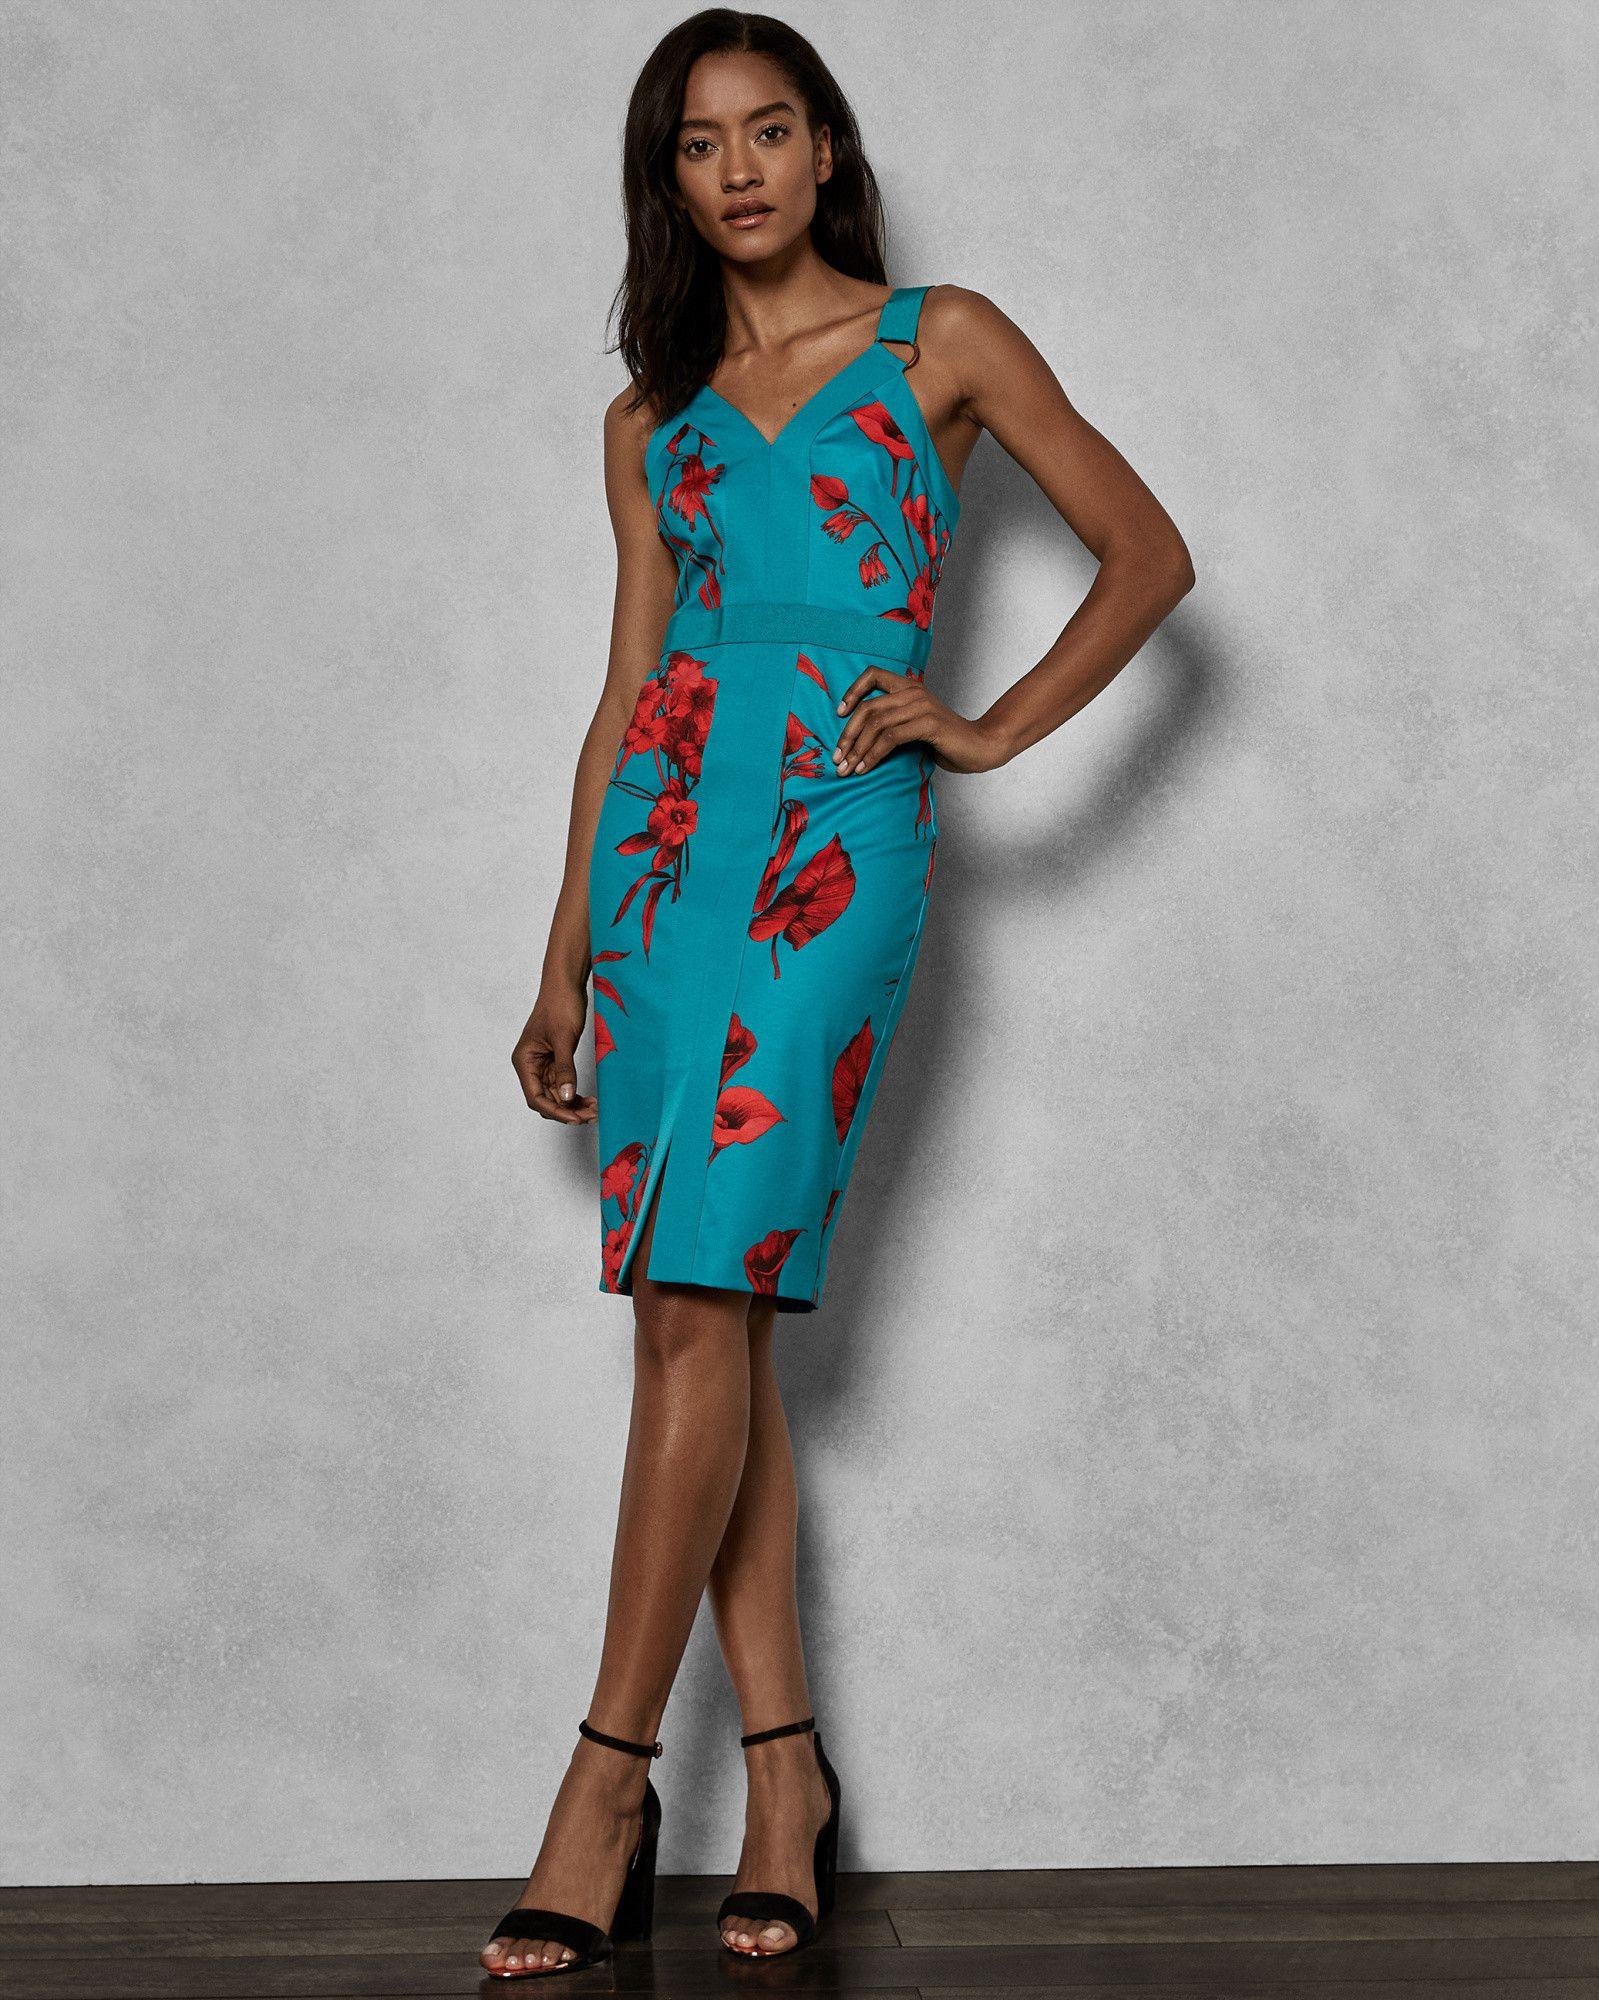 eb8e7f9b2196c5 Ted Baker JORDJA Fantasia panel bodycon dress in 2019 | Fashion ...